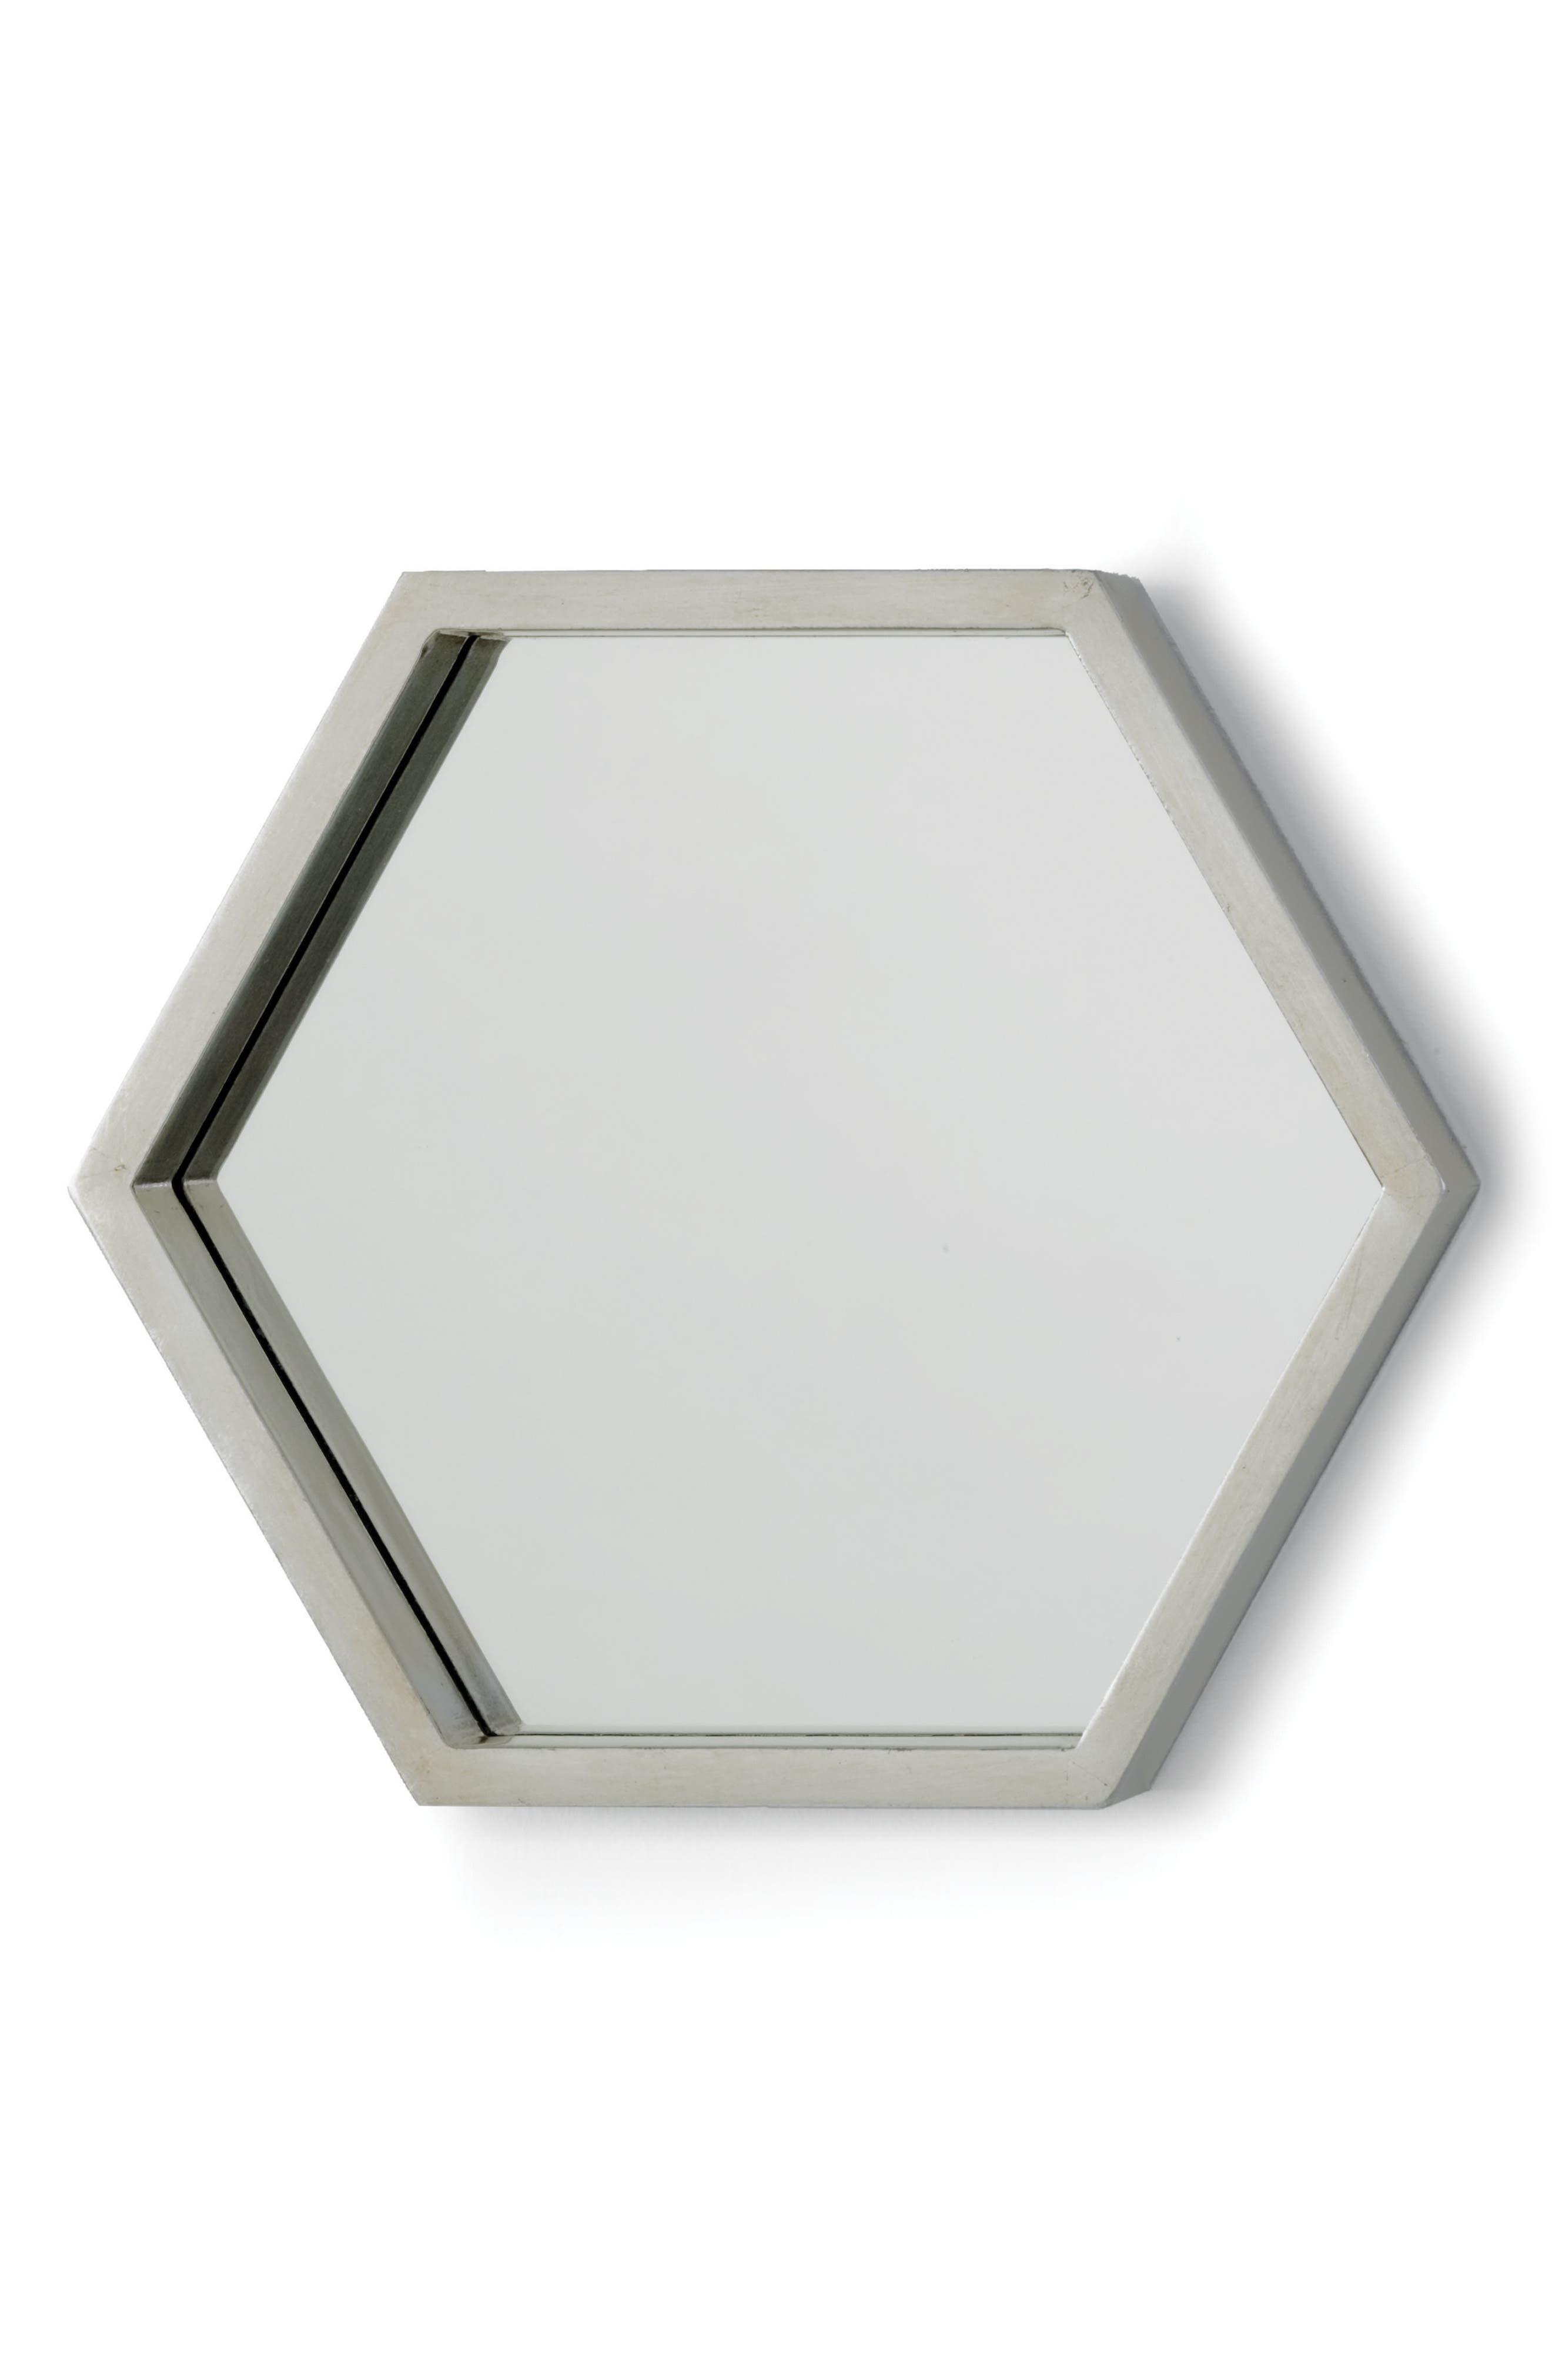 Main Image - Regina Andrew Set of 5 Beehive Mirrors